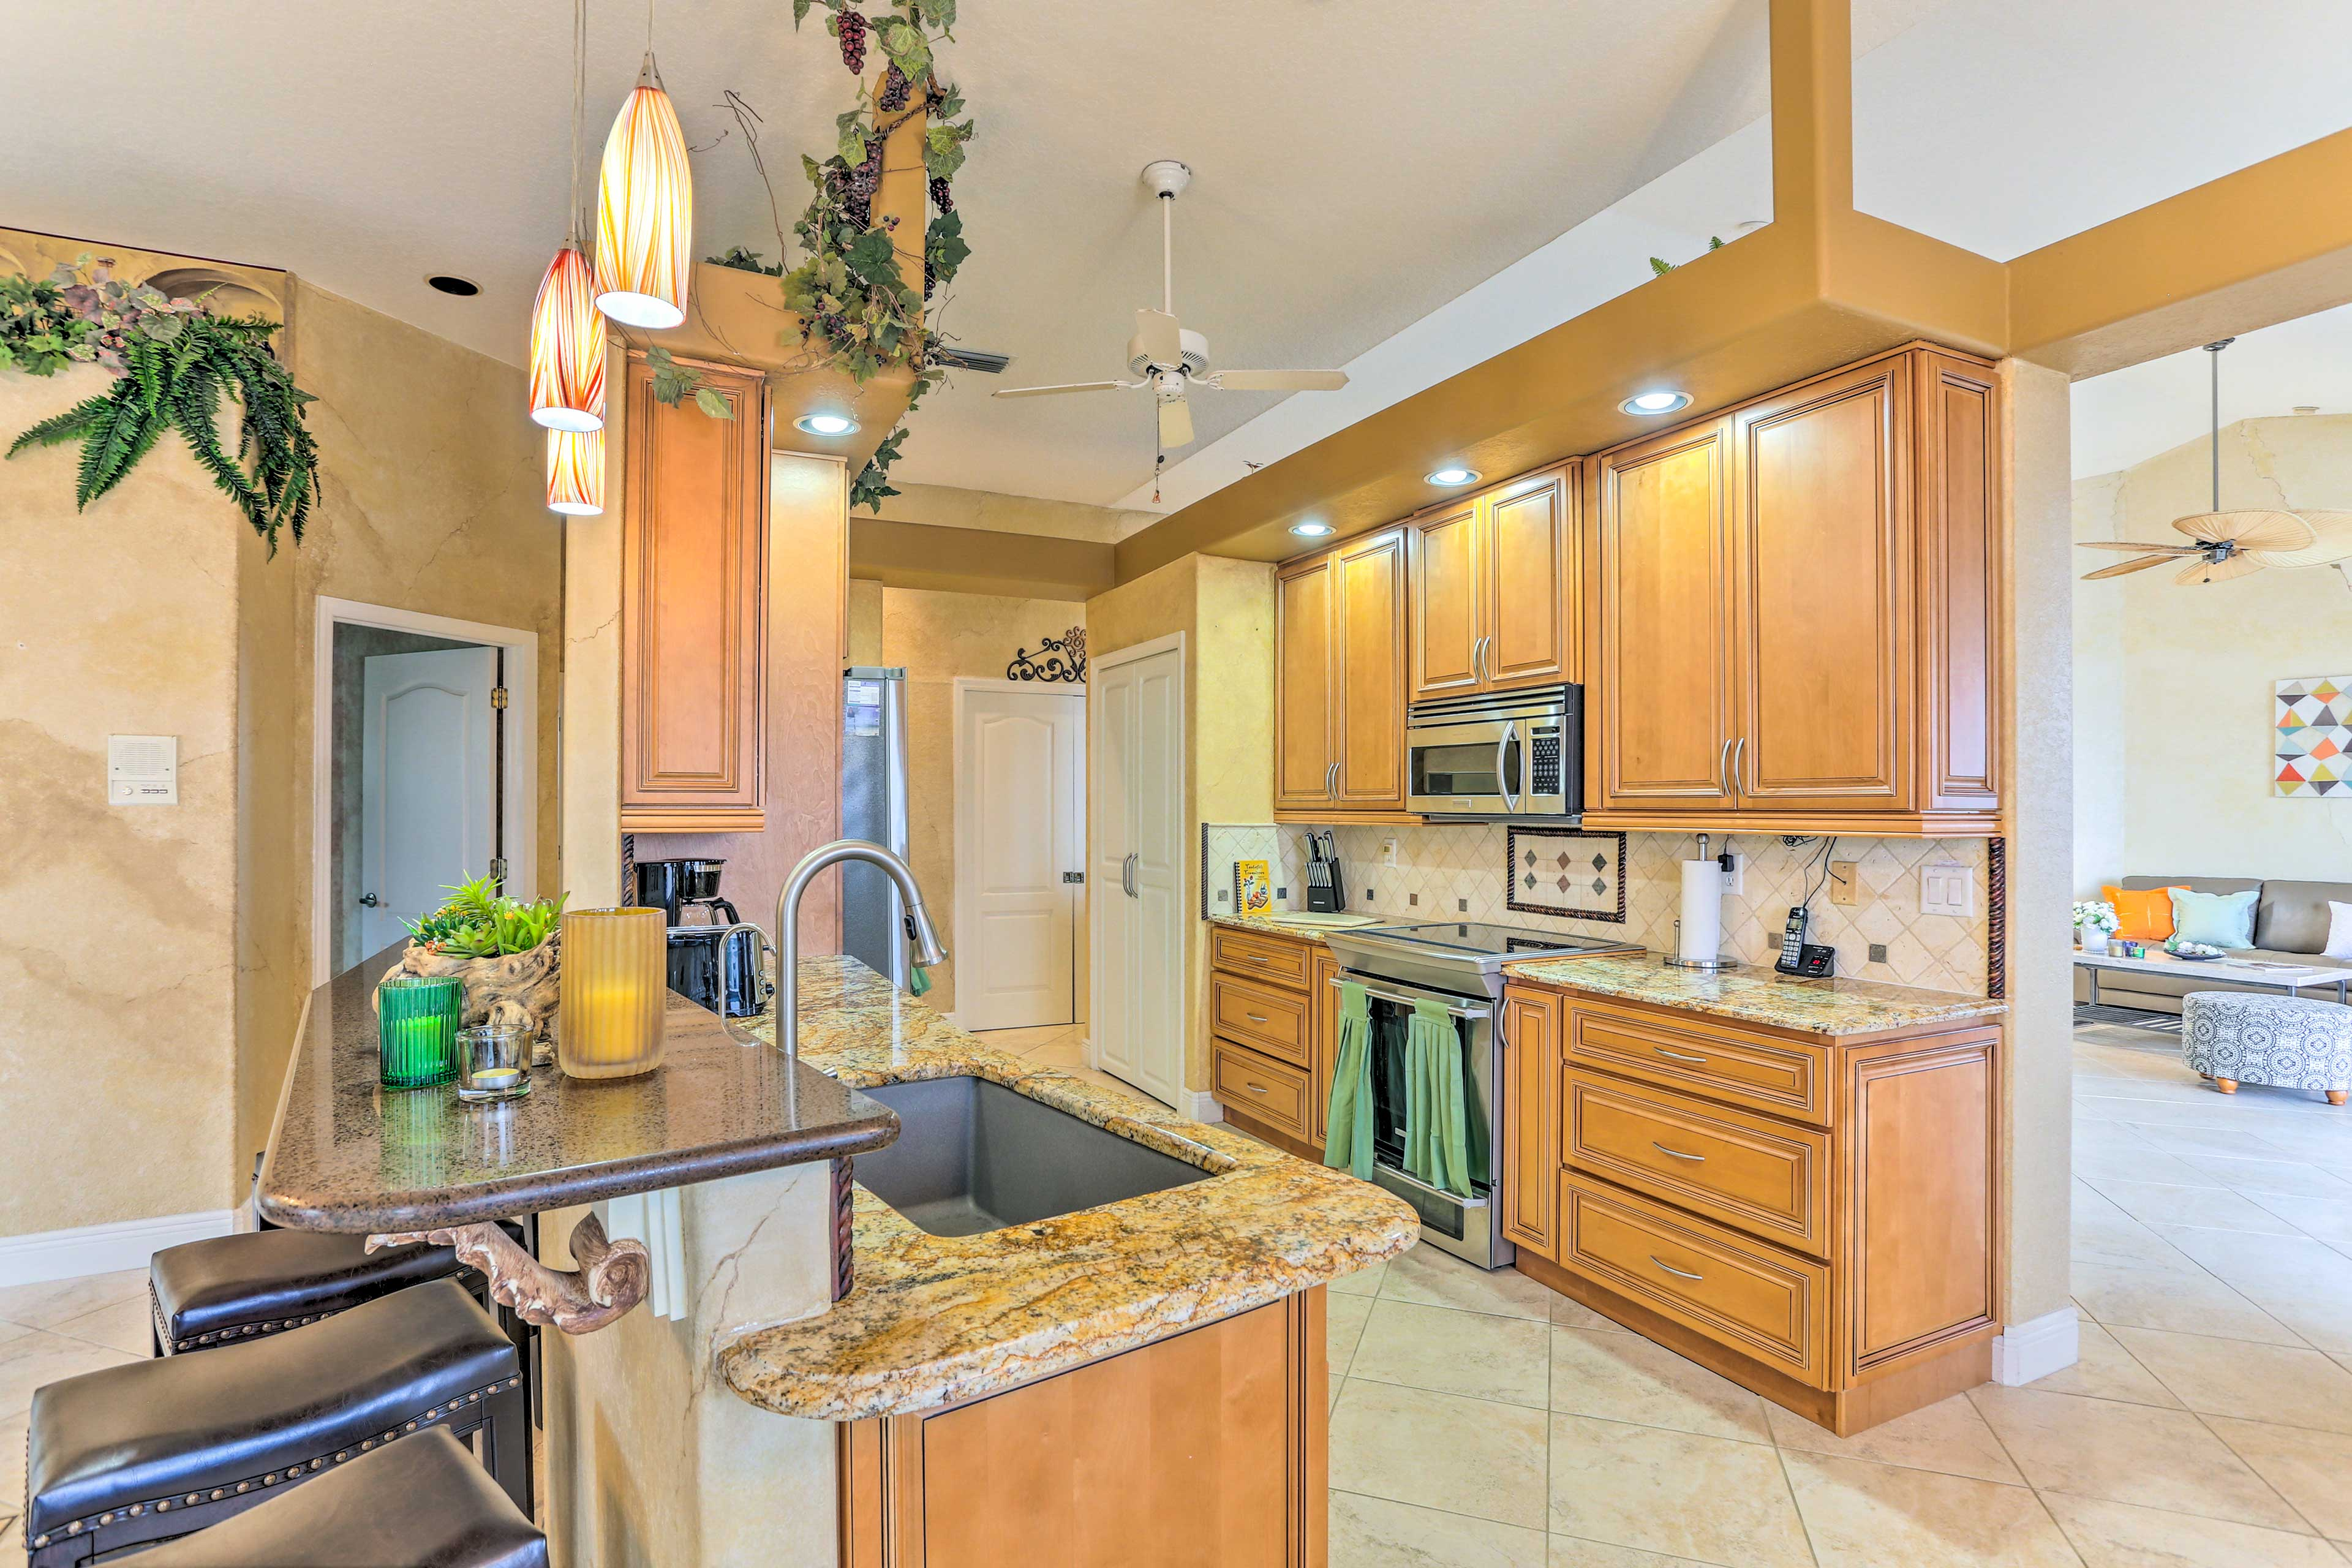 The open, spacious kitchen allows everyone to gather comfortably.